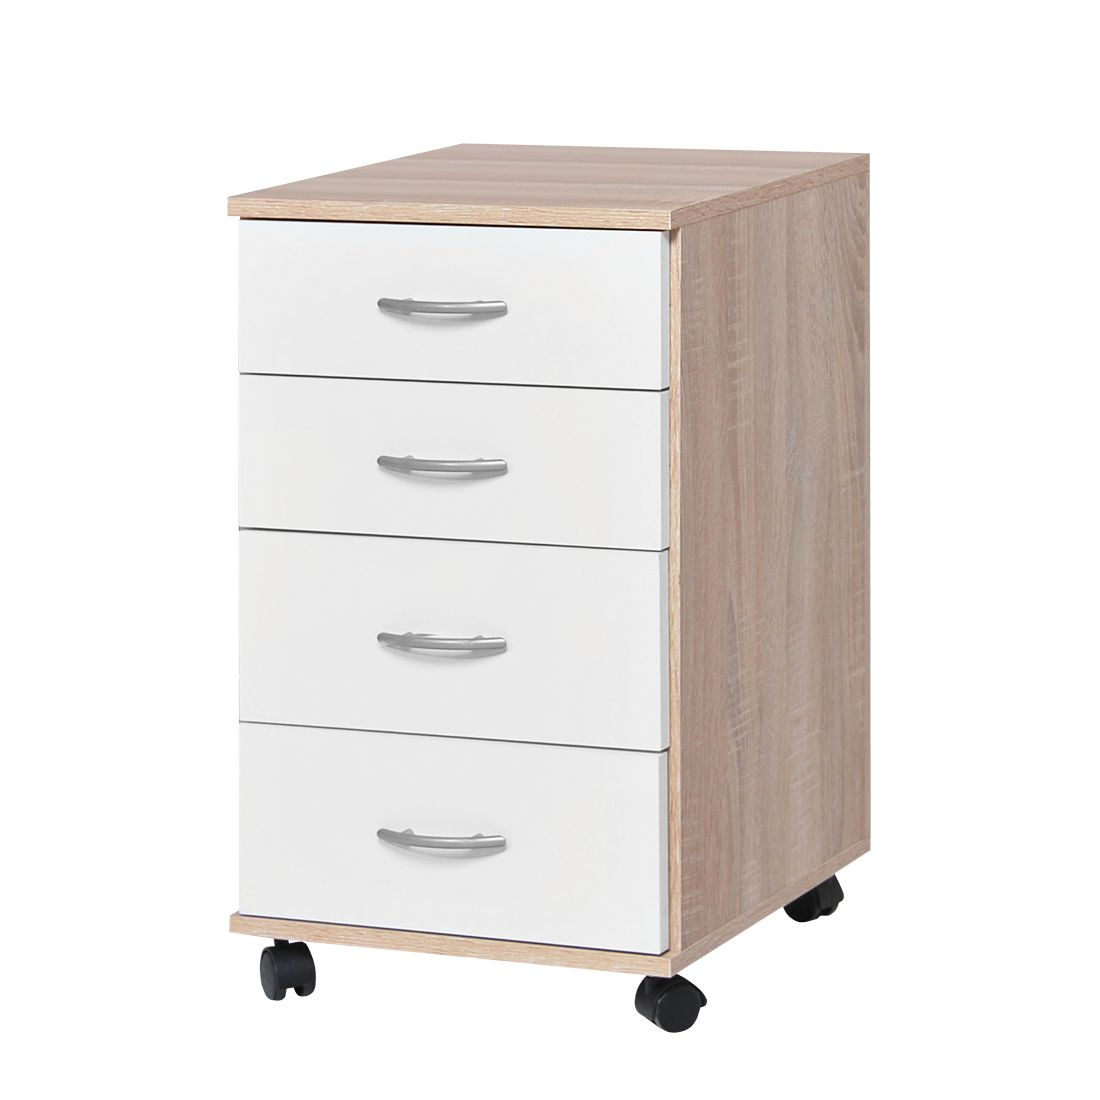 home24 Rollcontainer Dirk | Büro > Büroschränke > Rollcontainer | Beige | Holzwerkstoff | home24office